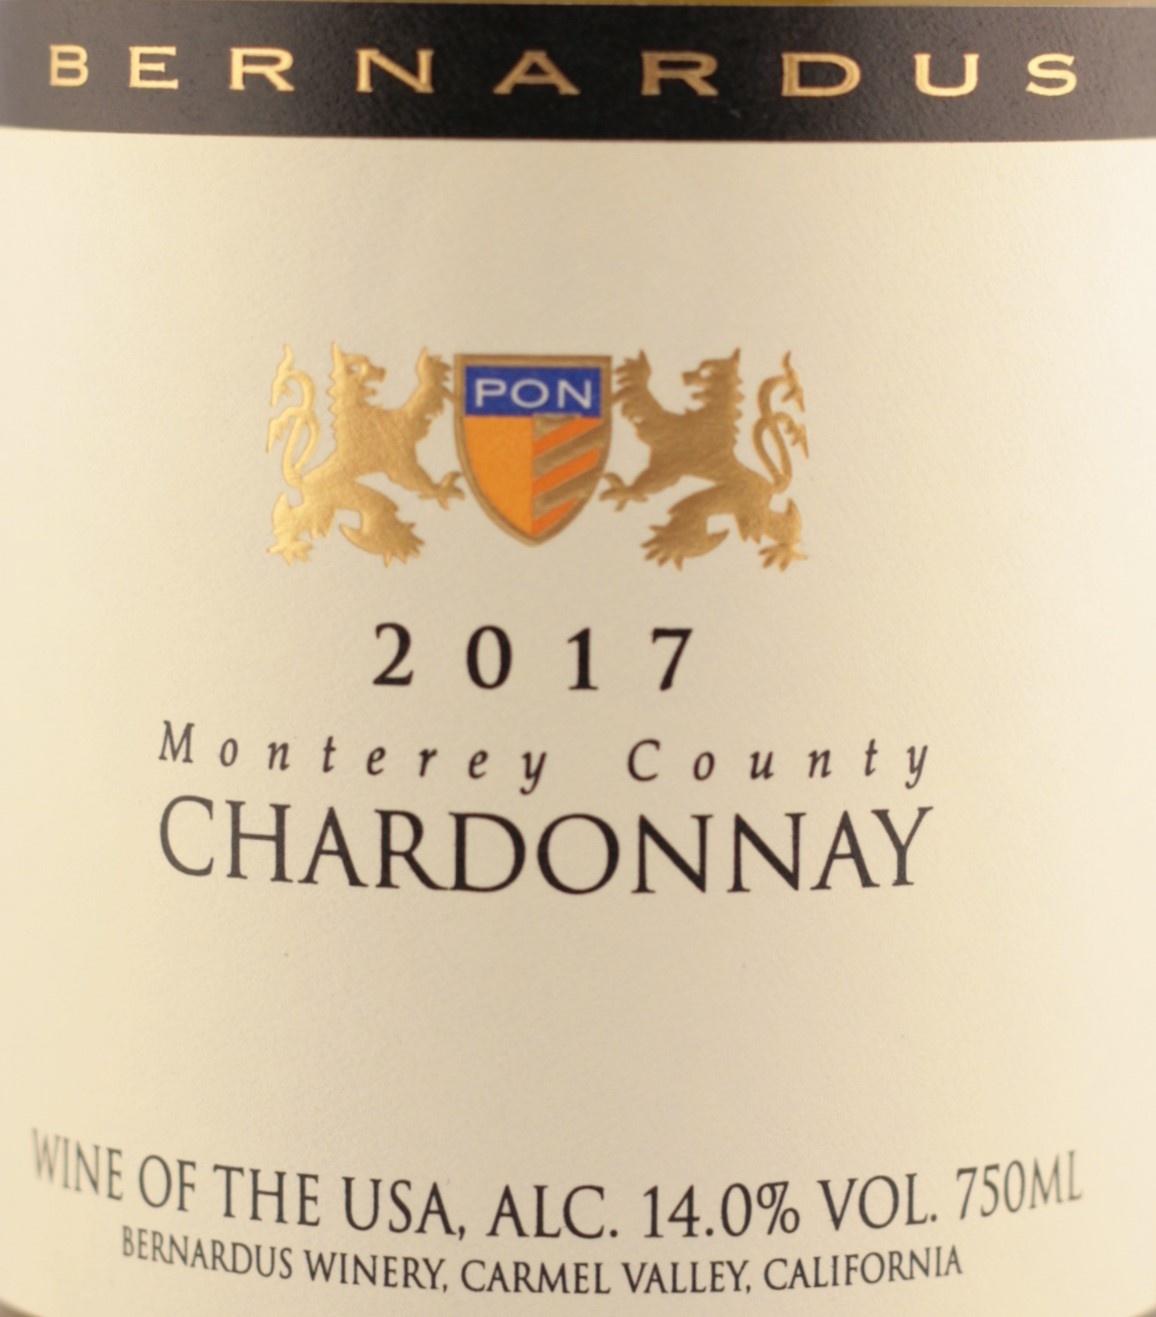 Bernardus Winery | 2017 | Monterey County| USA | Chardonnay